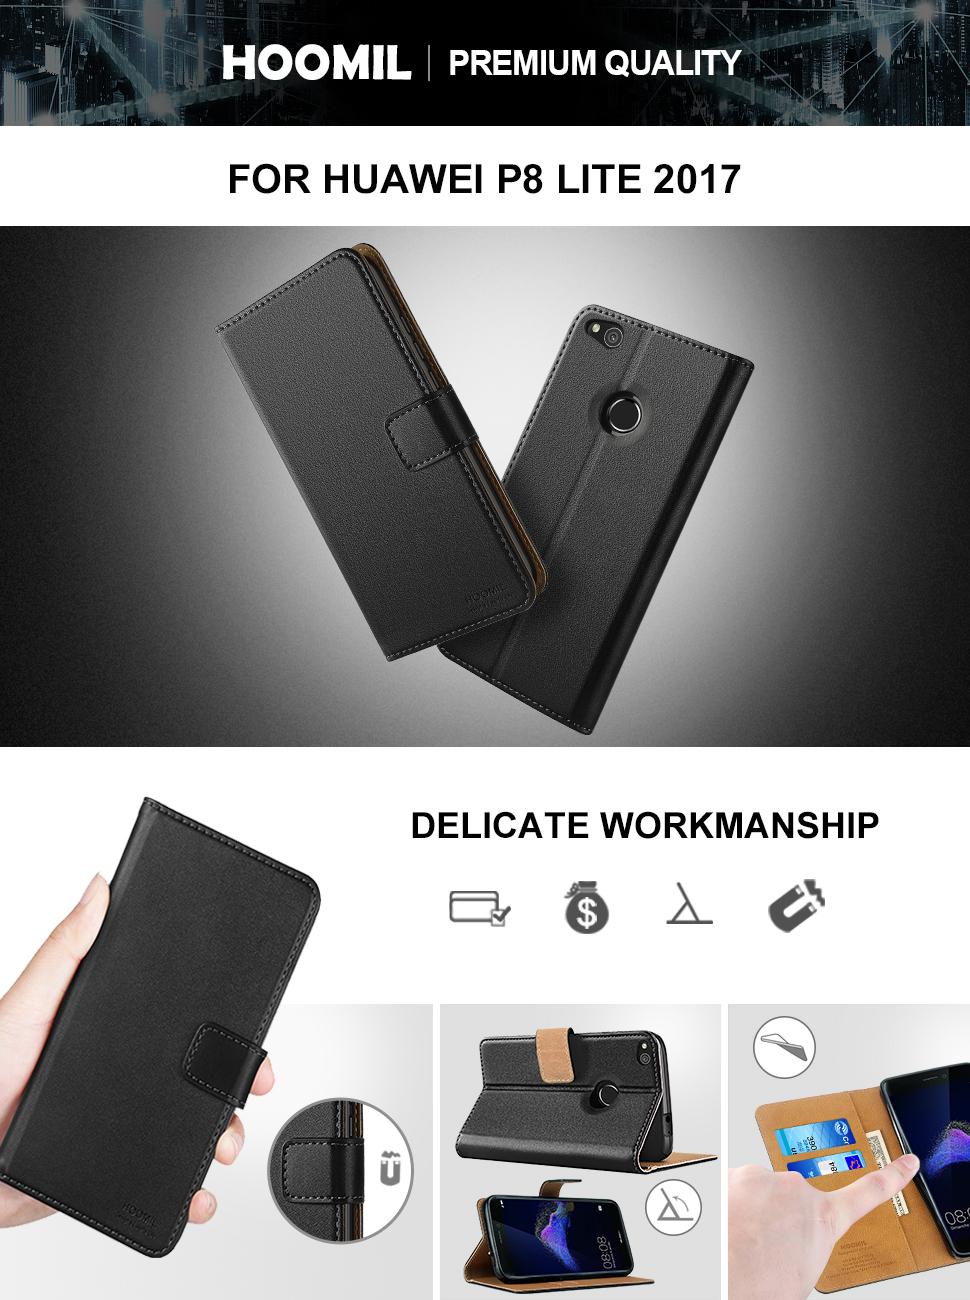 Huawei P8 Lite 2017 Flip Cover Case